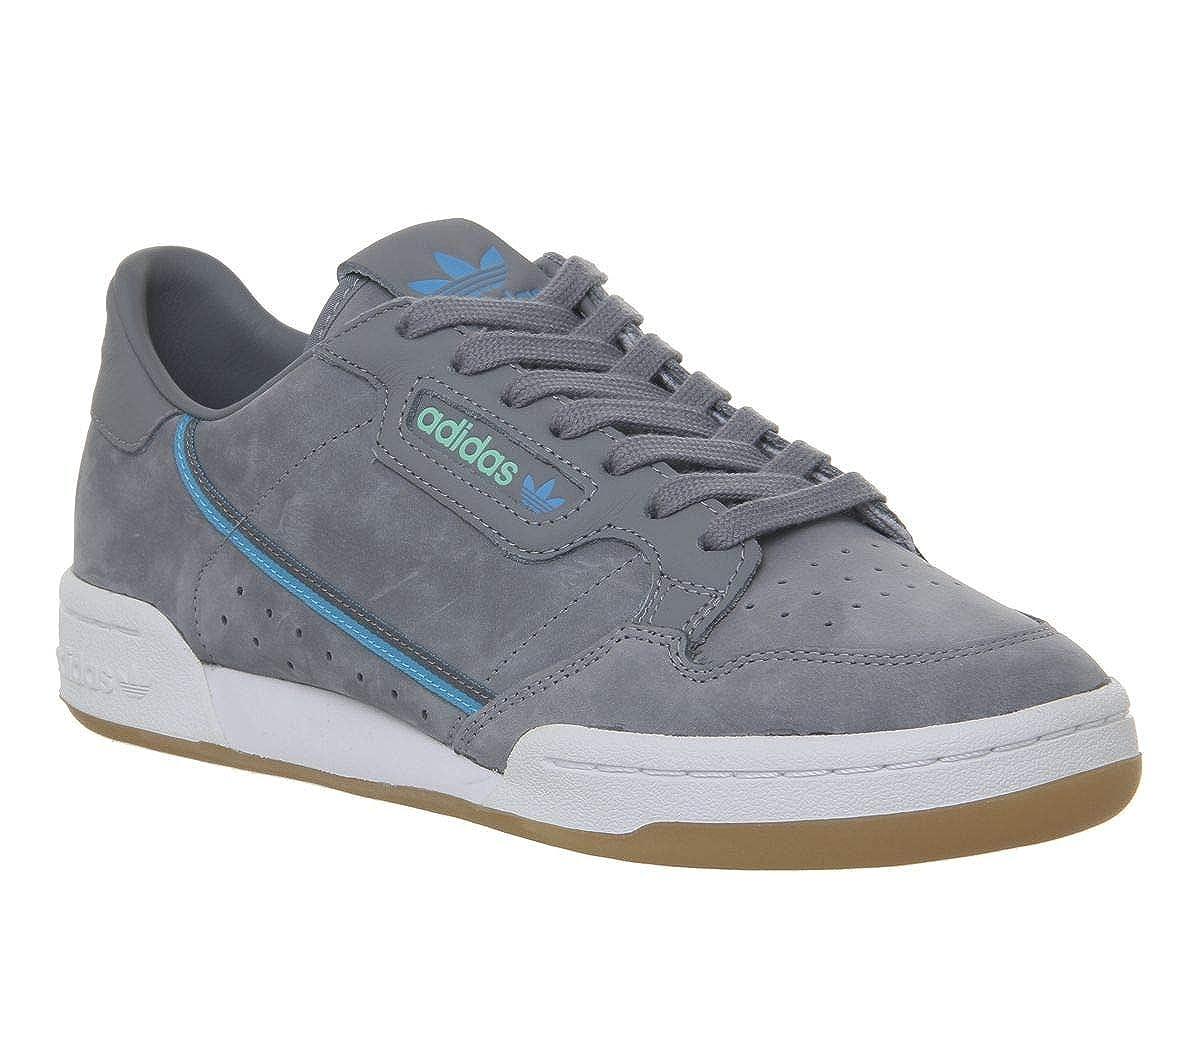 finest selection 6f970 19b02 Amazon.com | adidas Originals x TfL Continental 80 Grey ...